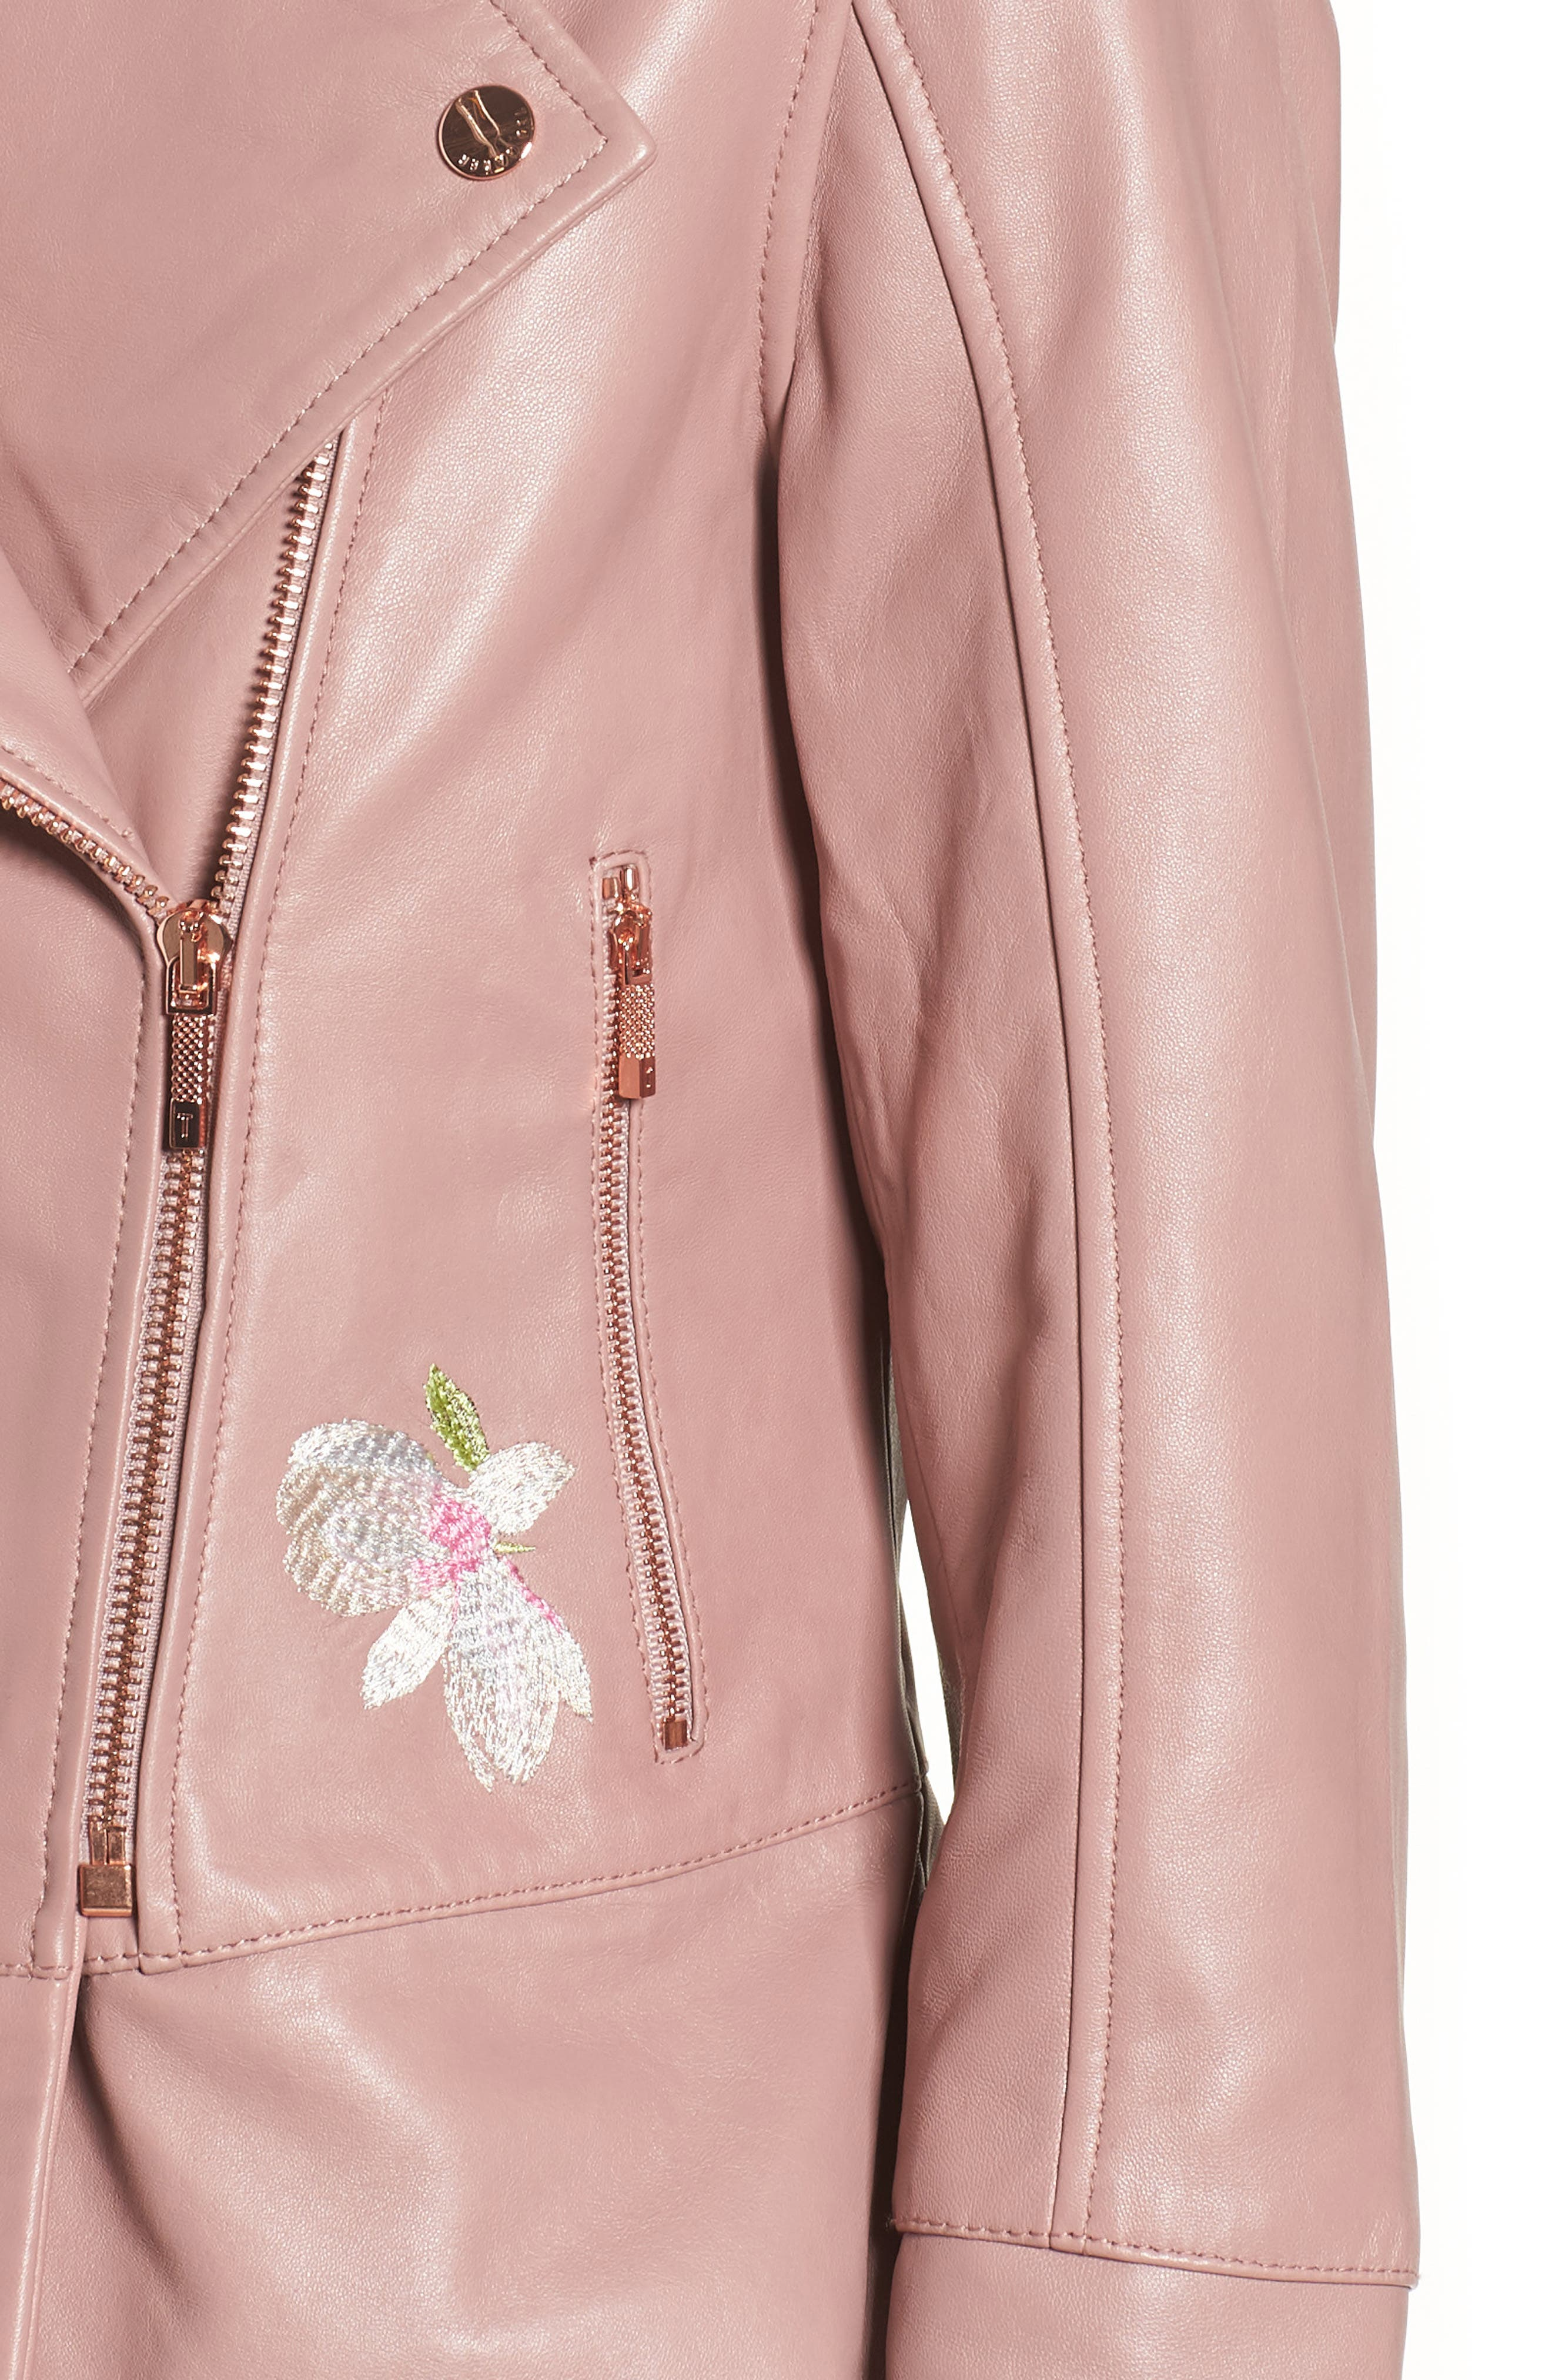 Harmony Embroidered Leather Biker Jacket,                             Alternate thumbnail 4, color,                             Dusky Pink